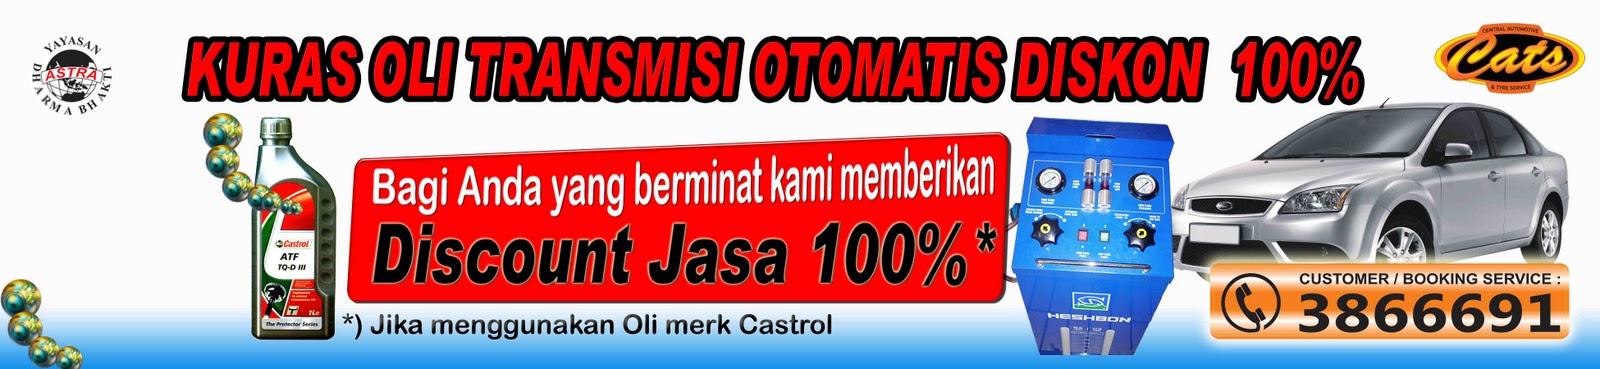 Spanduk Bakso Malang Download Desain Grafis